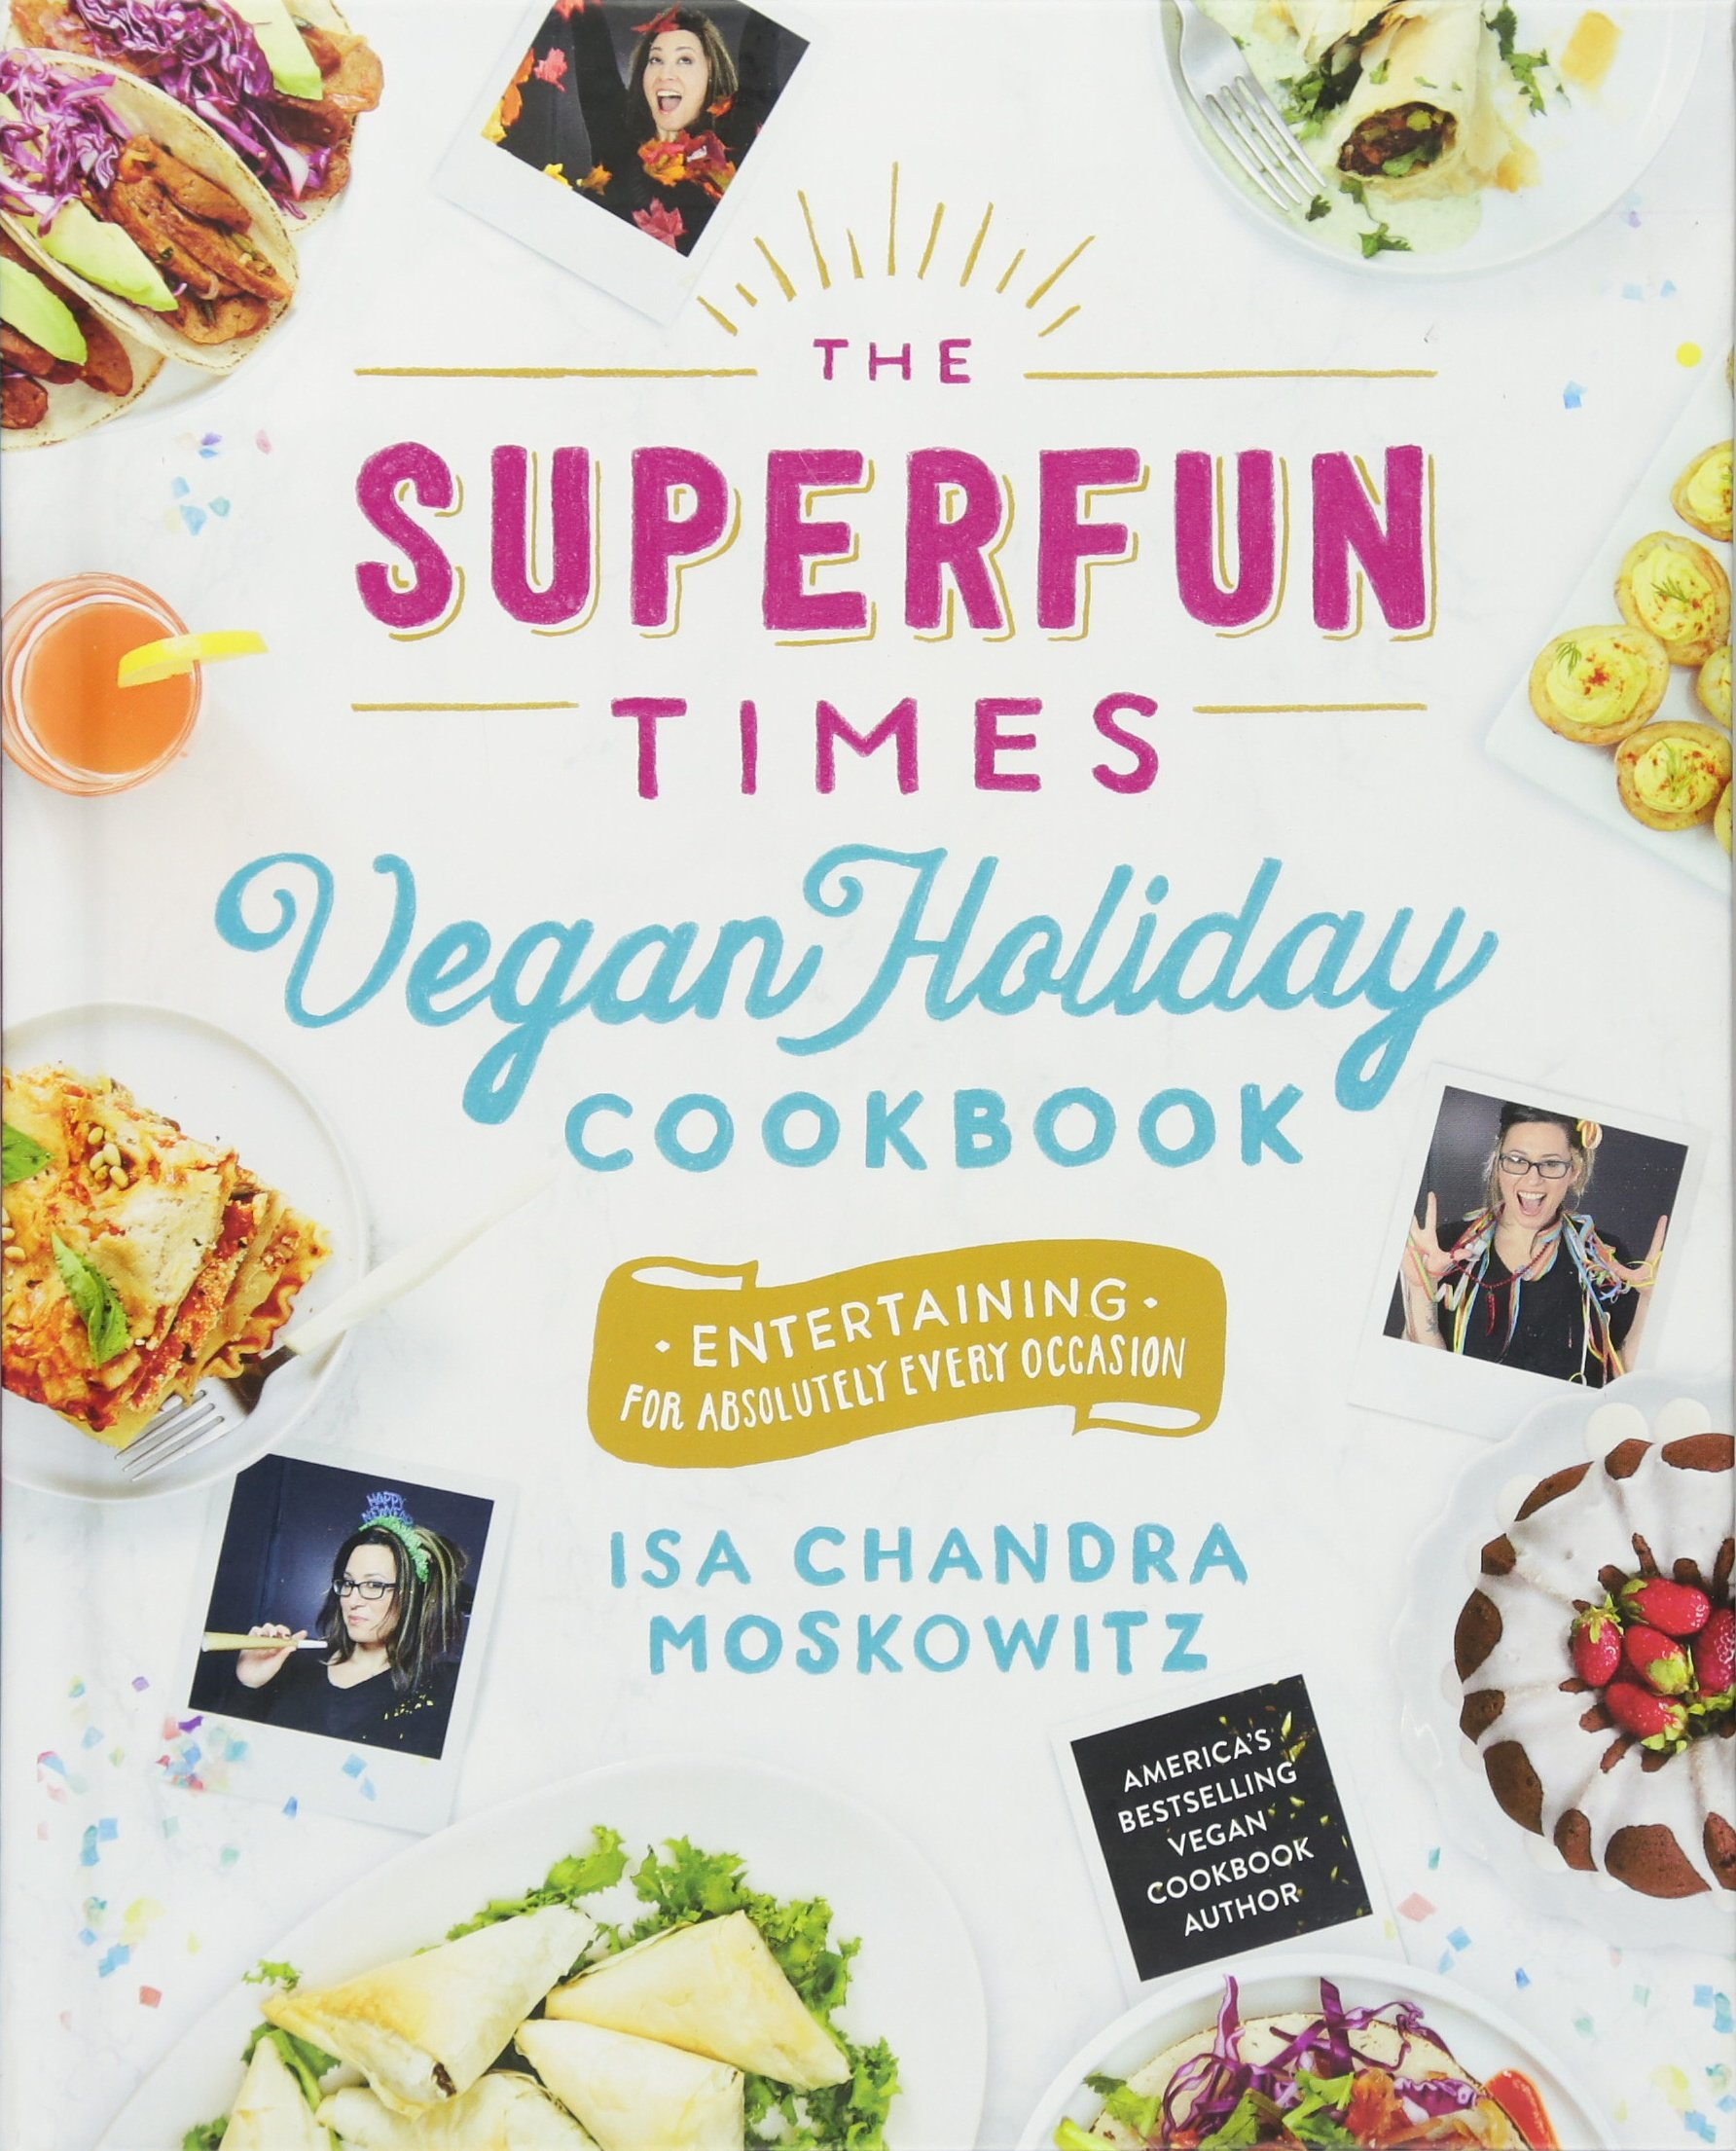 Superfun Times Vegan Holiday Cookbook product image